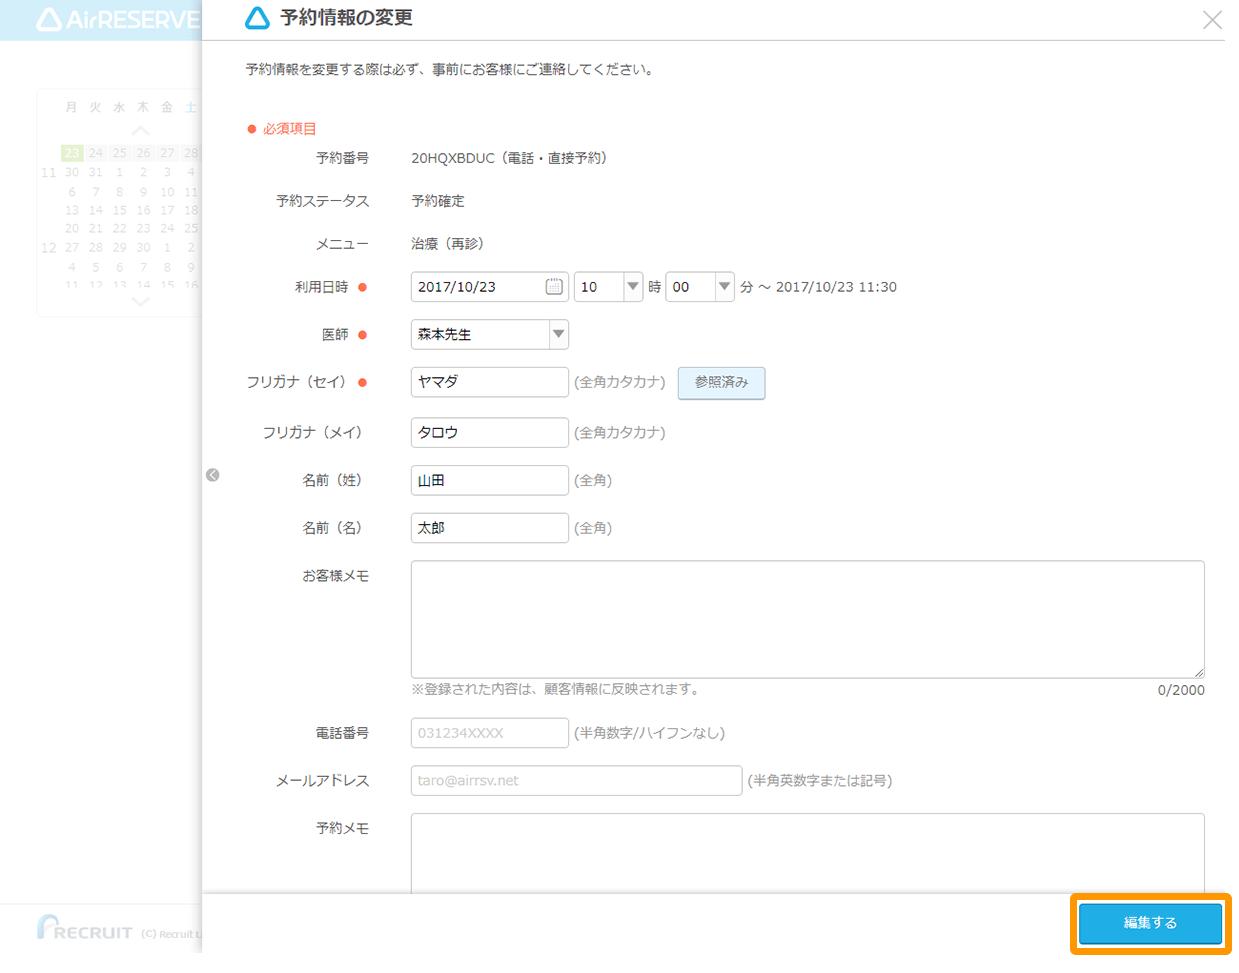 Airリザーブ 予約情報の変更画面(自由受付タイプ)